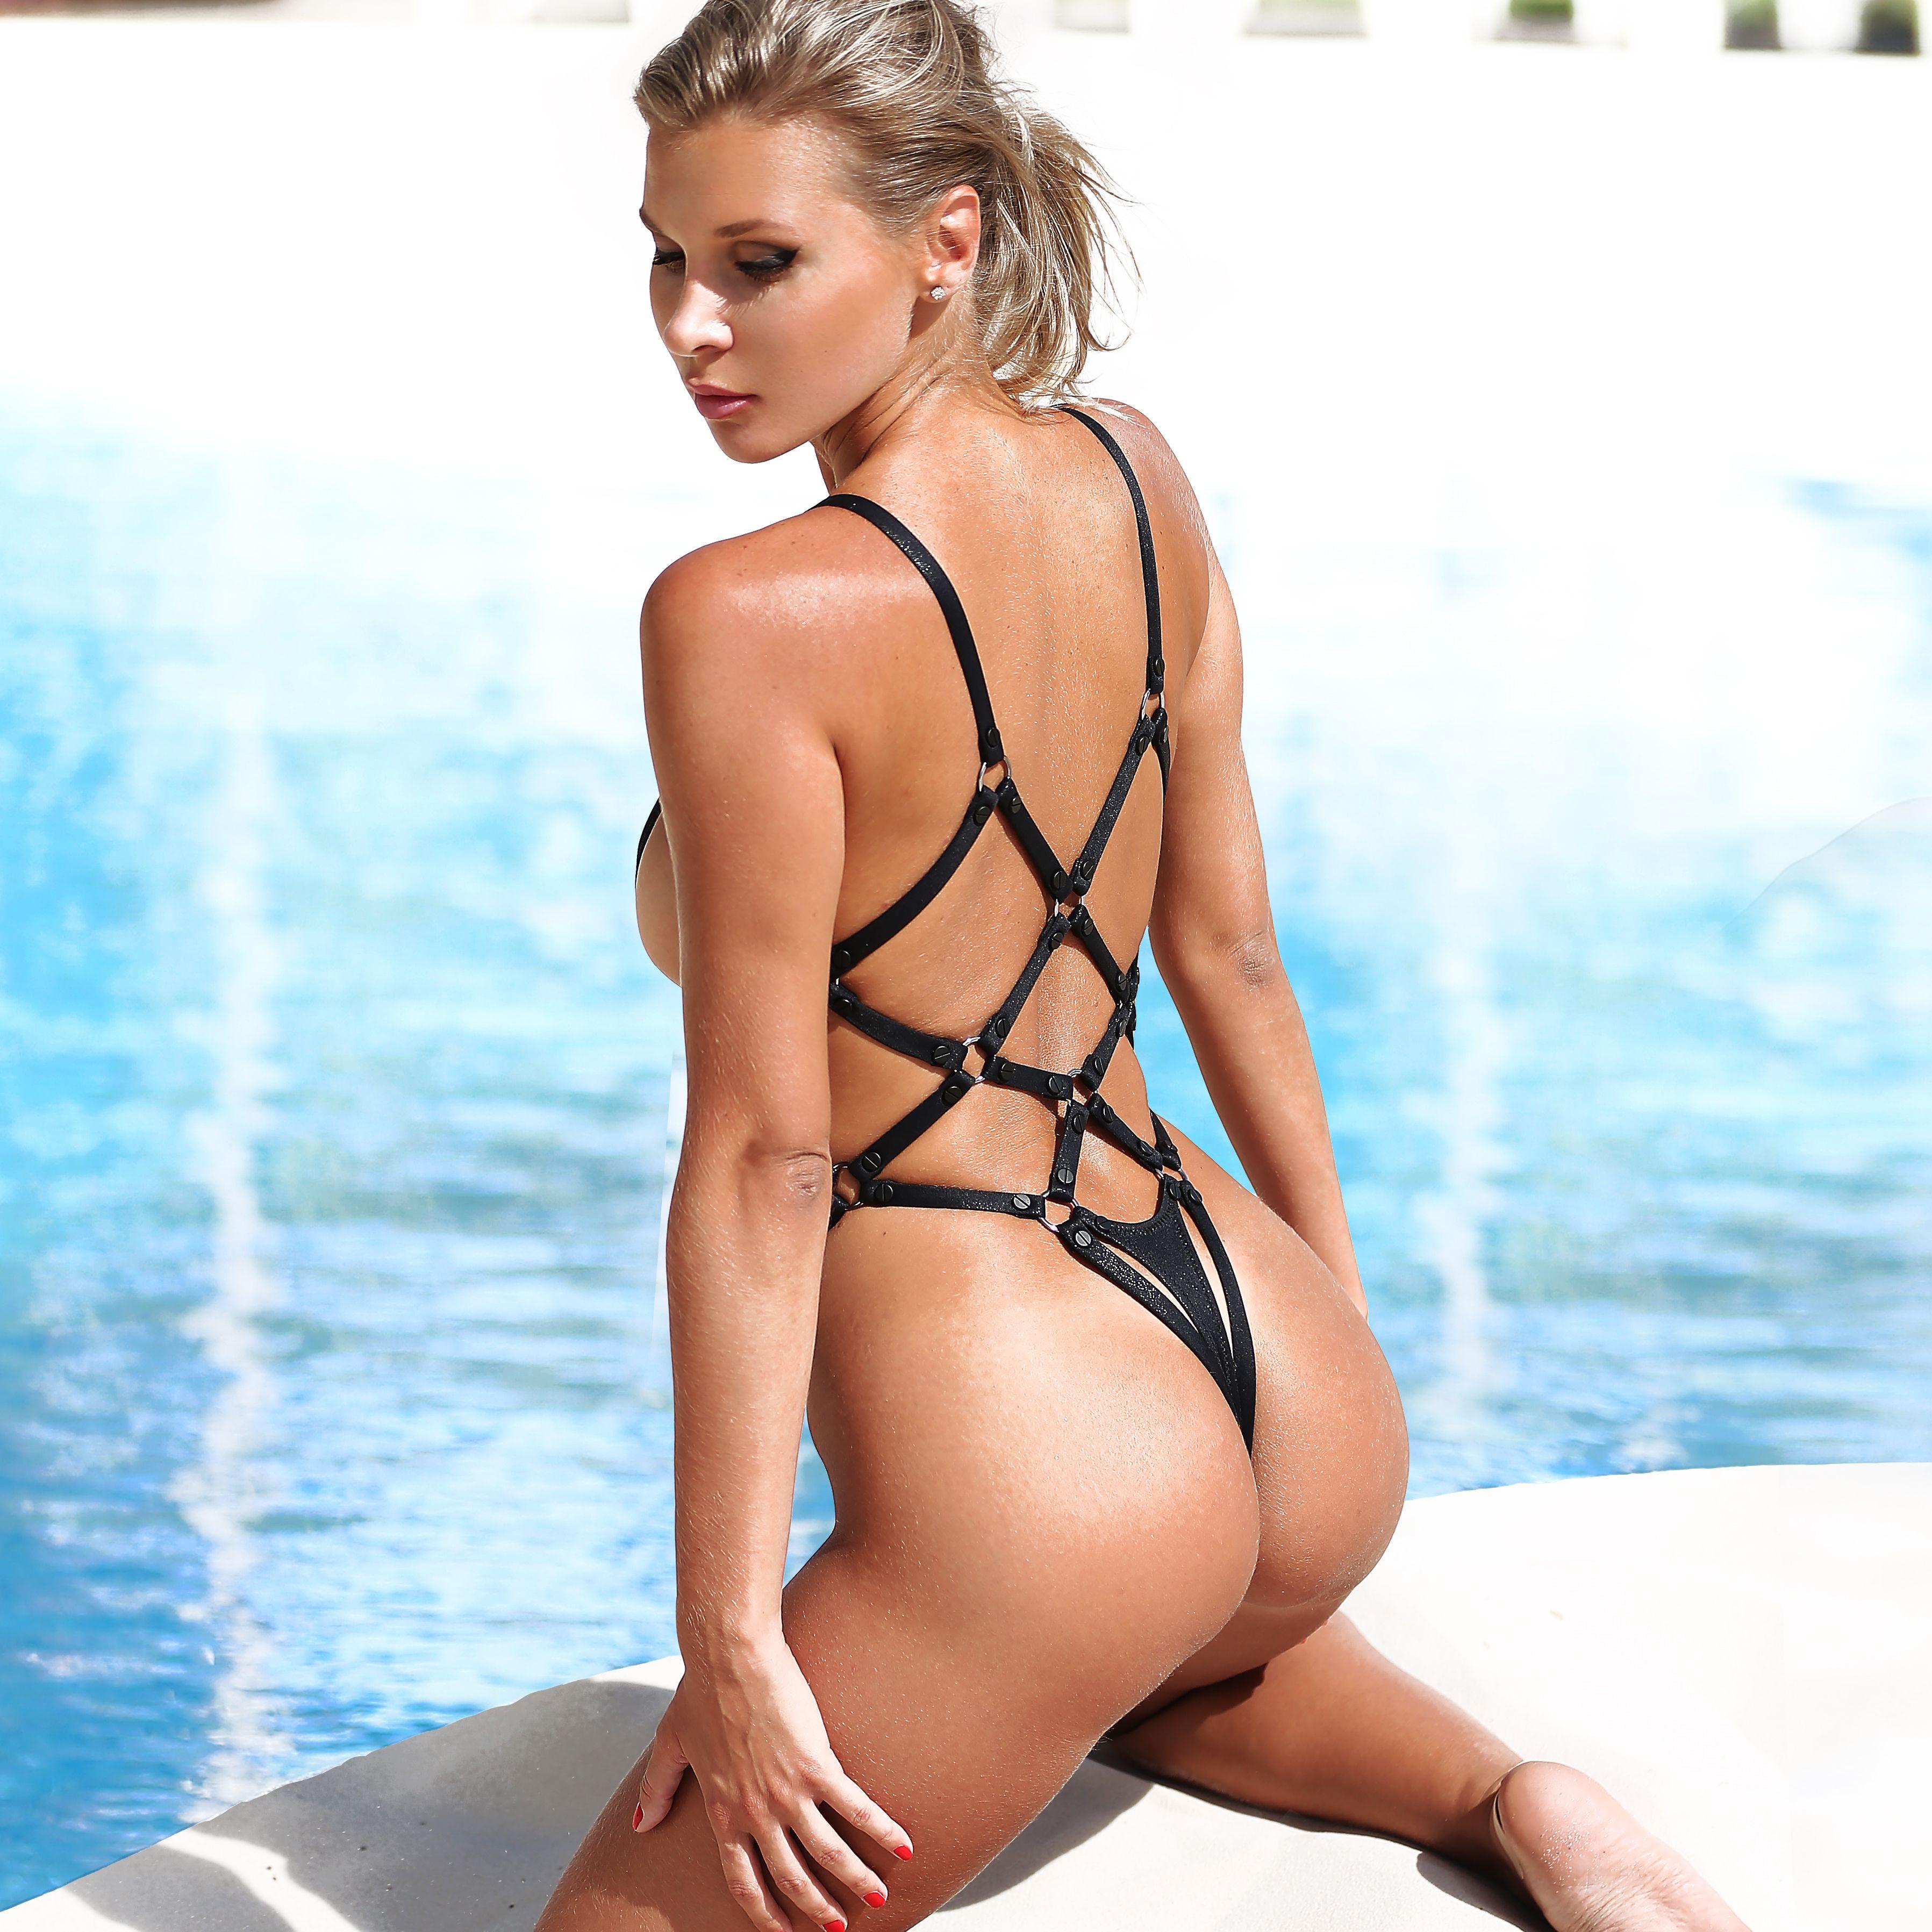 a22cc97506 Hot sexy one piece swimsuit harness Extreme monokini Thong Swimwear 2019  Women's swimwear, bathing suits